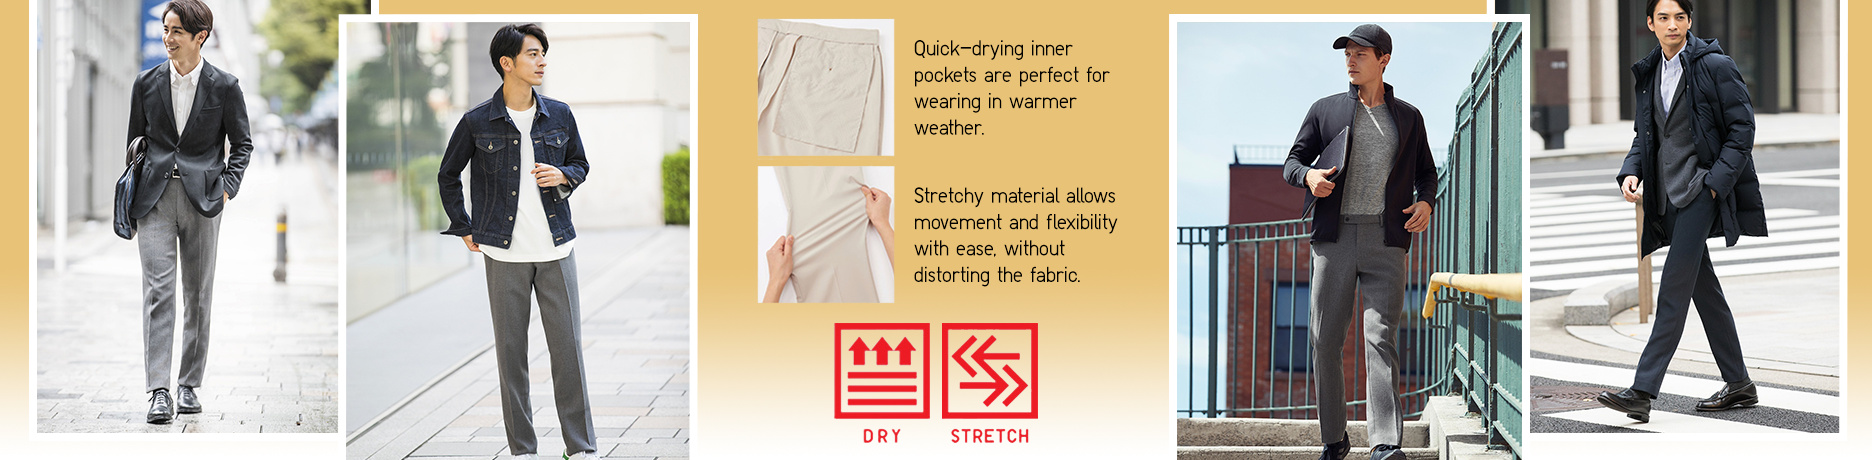 Dry Stretch